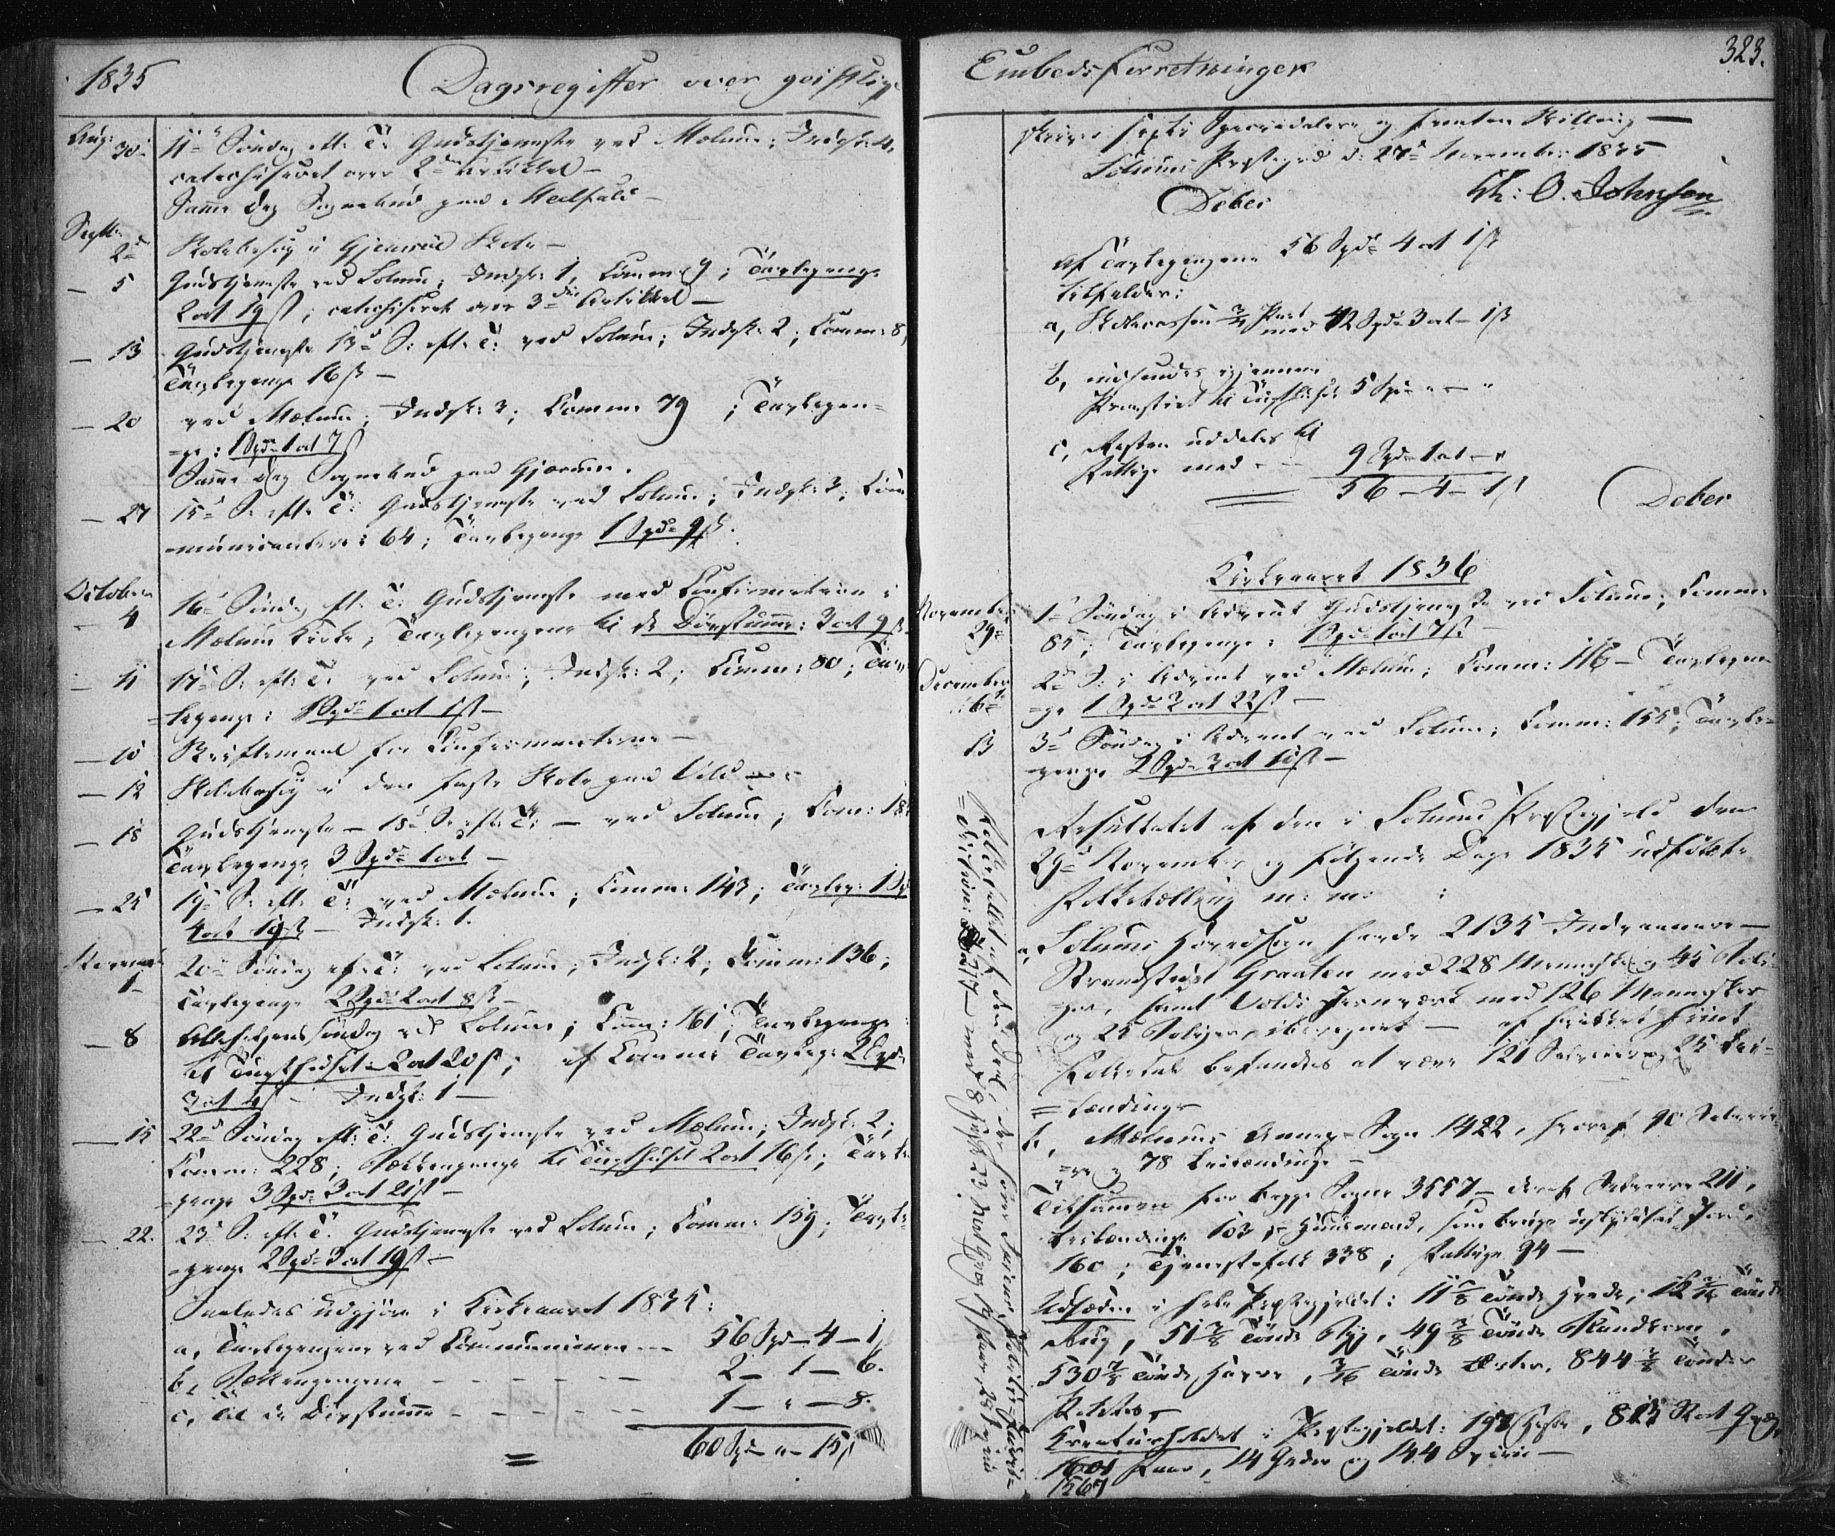 SAKO, Solum kirkebøker, F/Fa/L0005: Ministerialbok nr. I 5, 1833-1843, s. 323